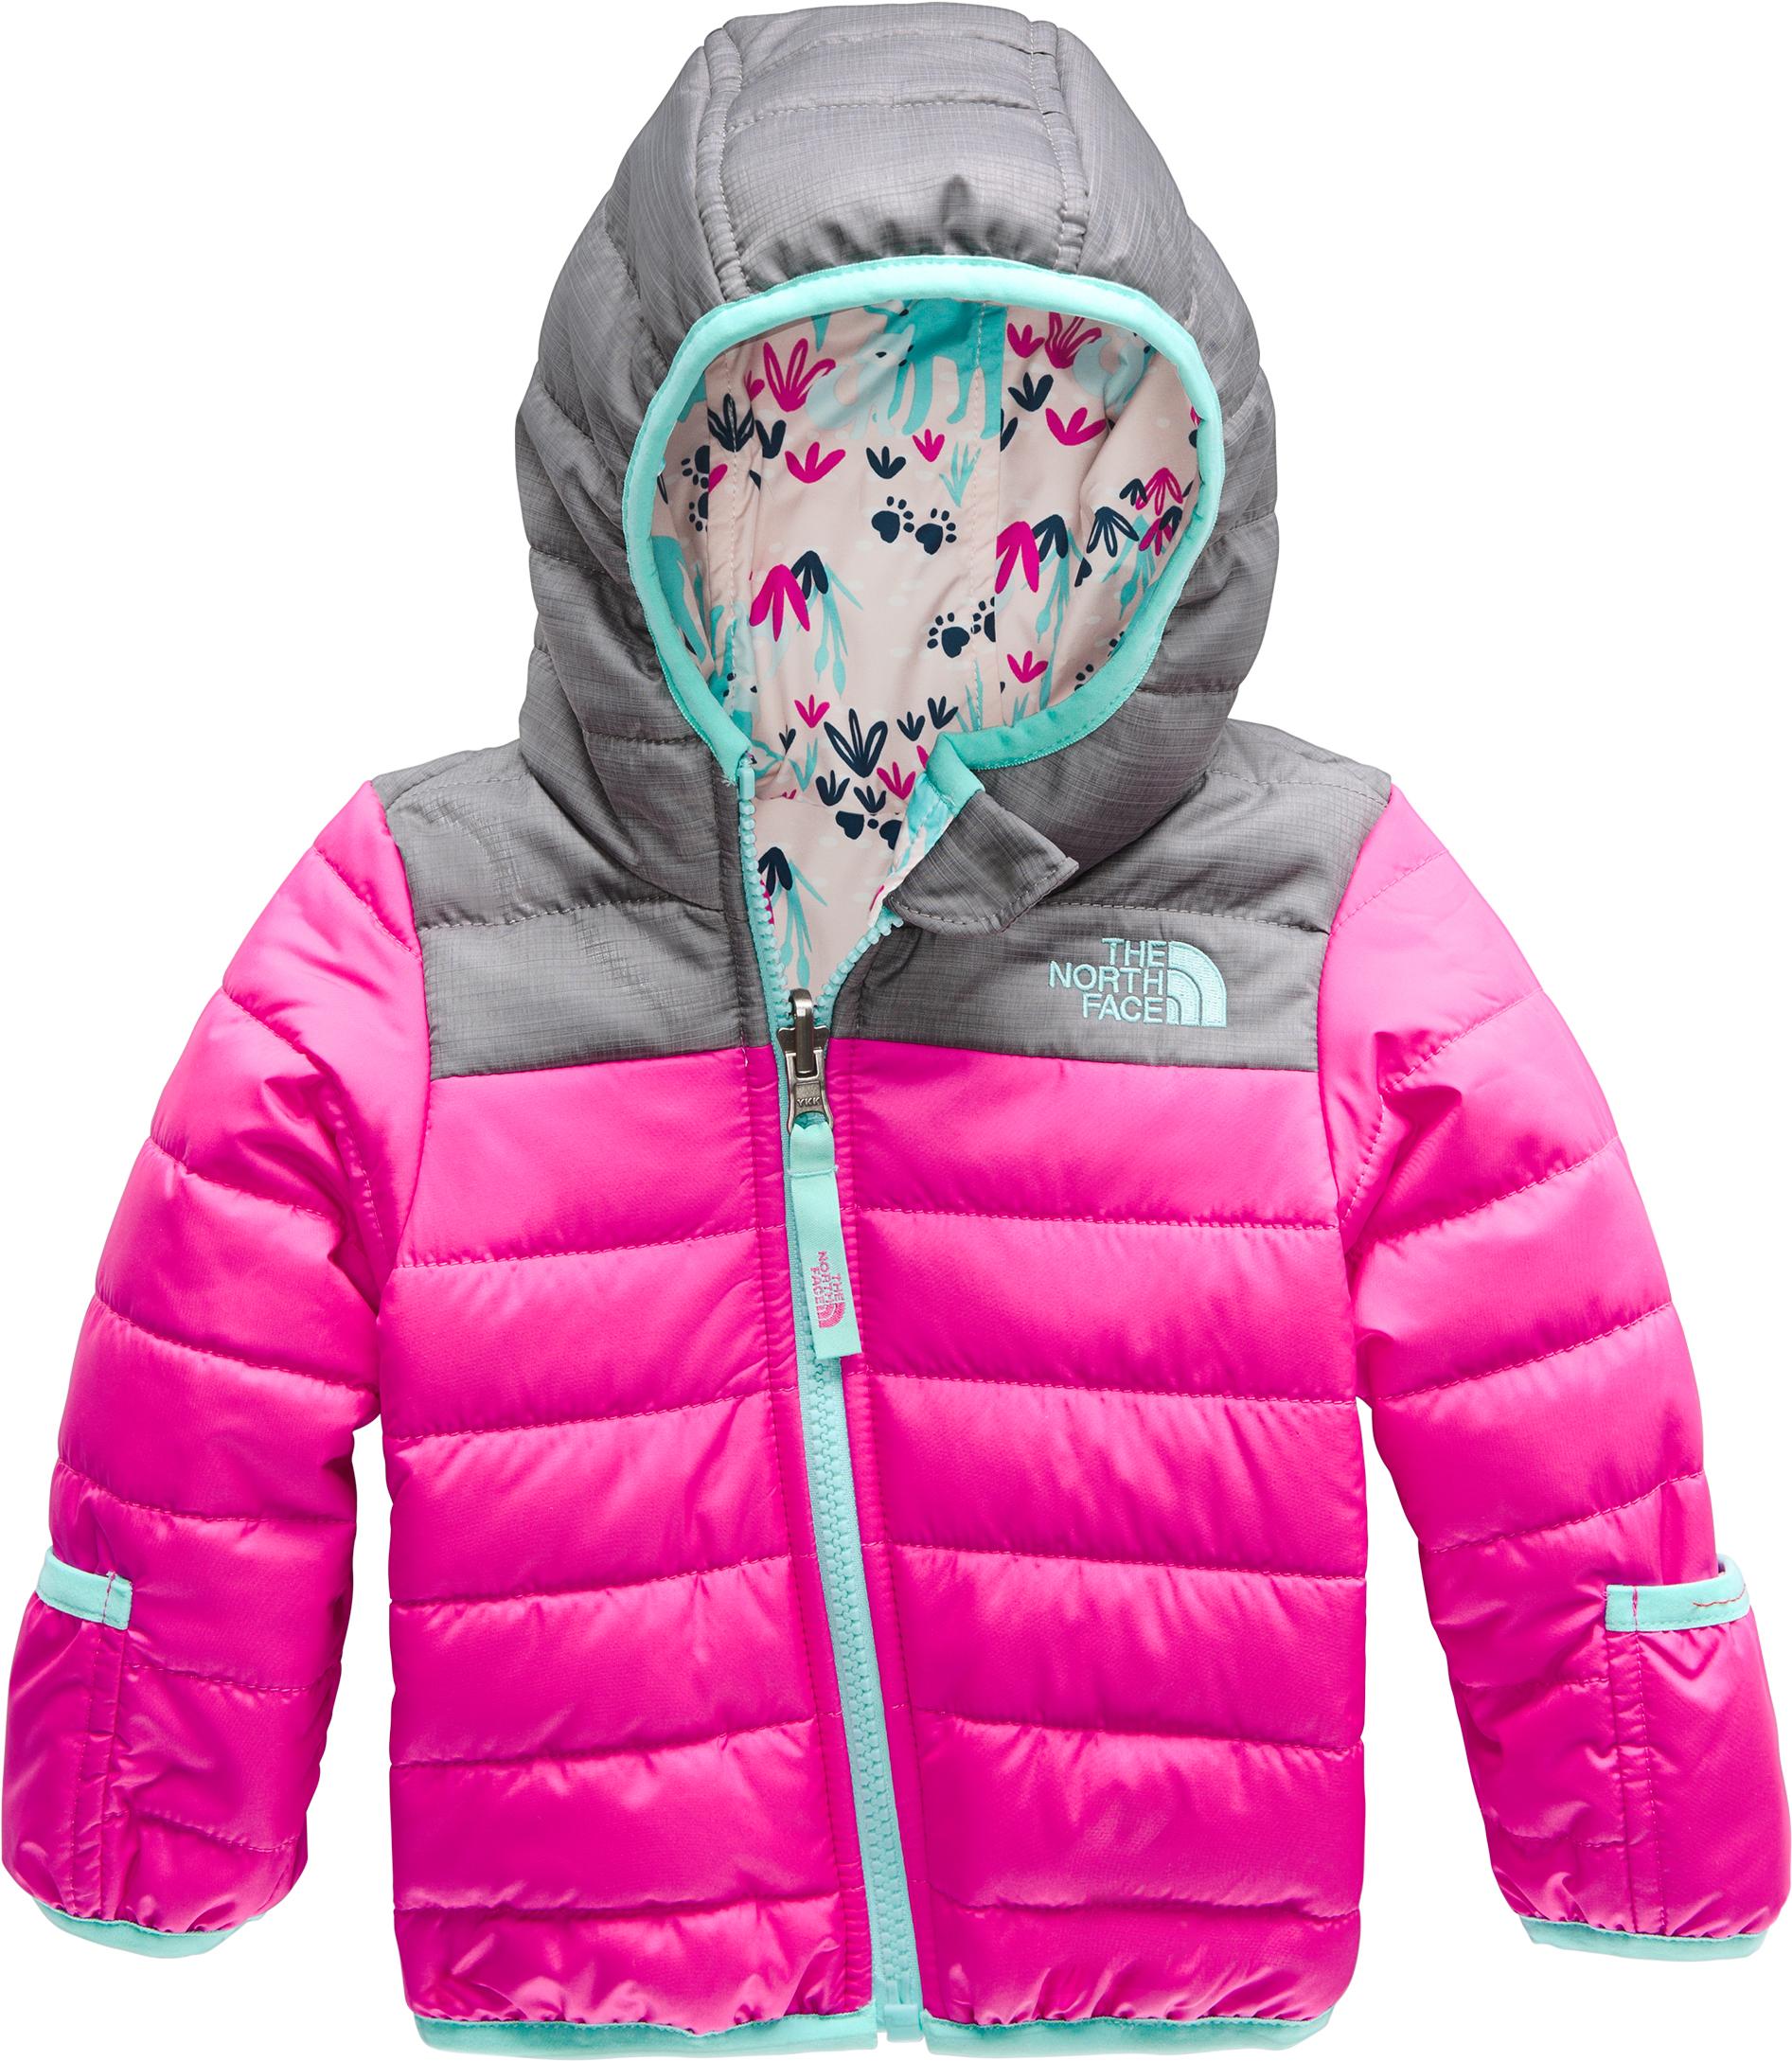 8cc9f19153d3 The North Face Reversible Perrito Jacket - Infants